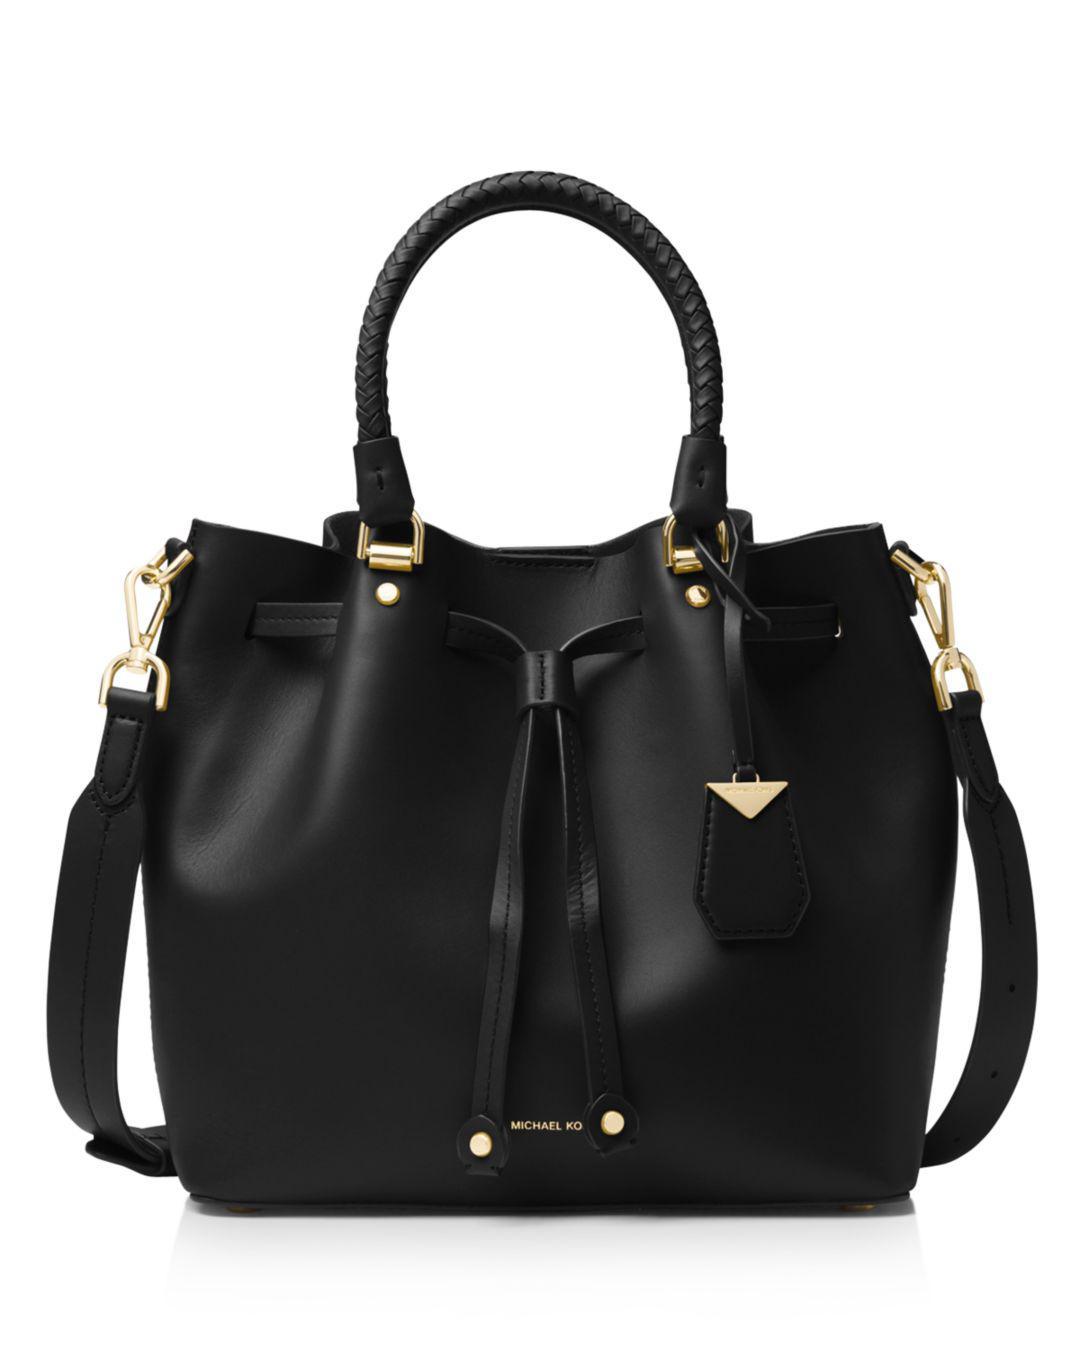 391f11b359fe Michael Michael Kors Medium Leather Bucket Bag in Black - Lyst